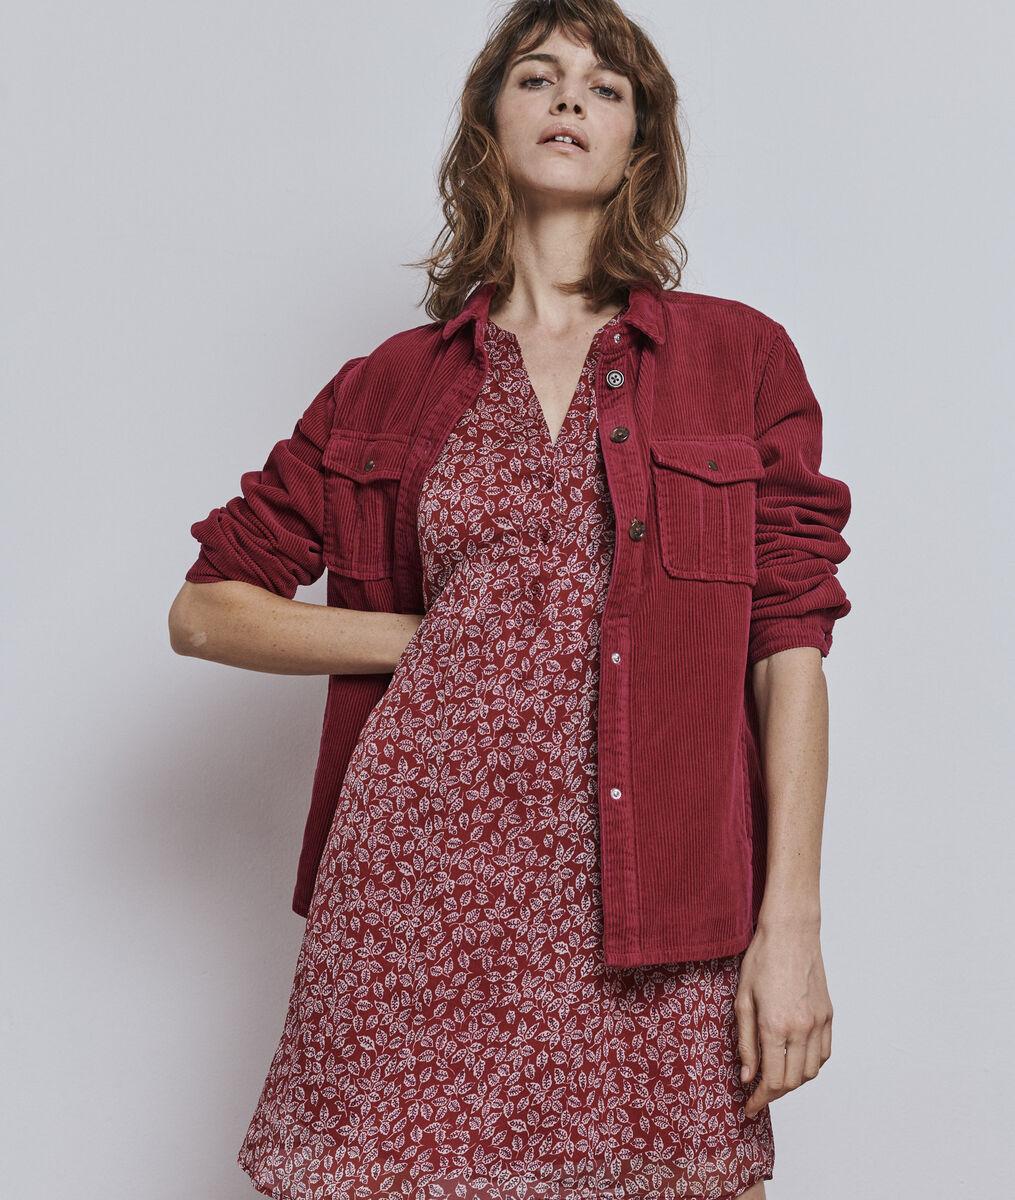 Rotes Kleid mit Blumenprint Calypso Damen | Maison 123